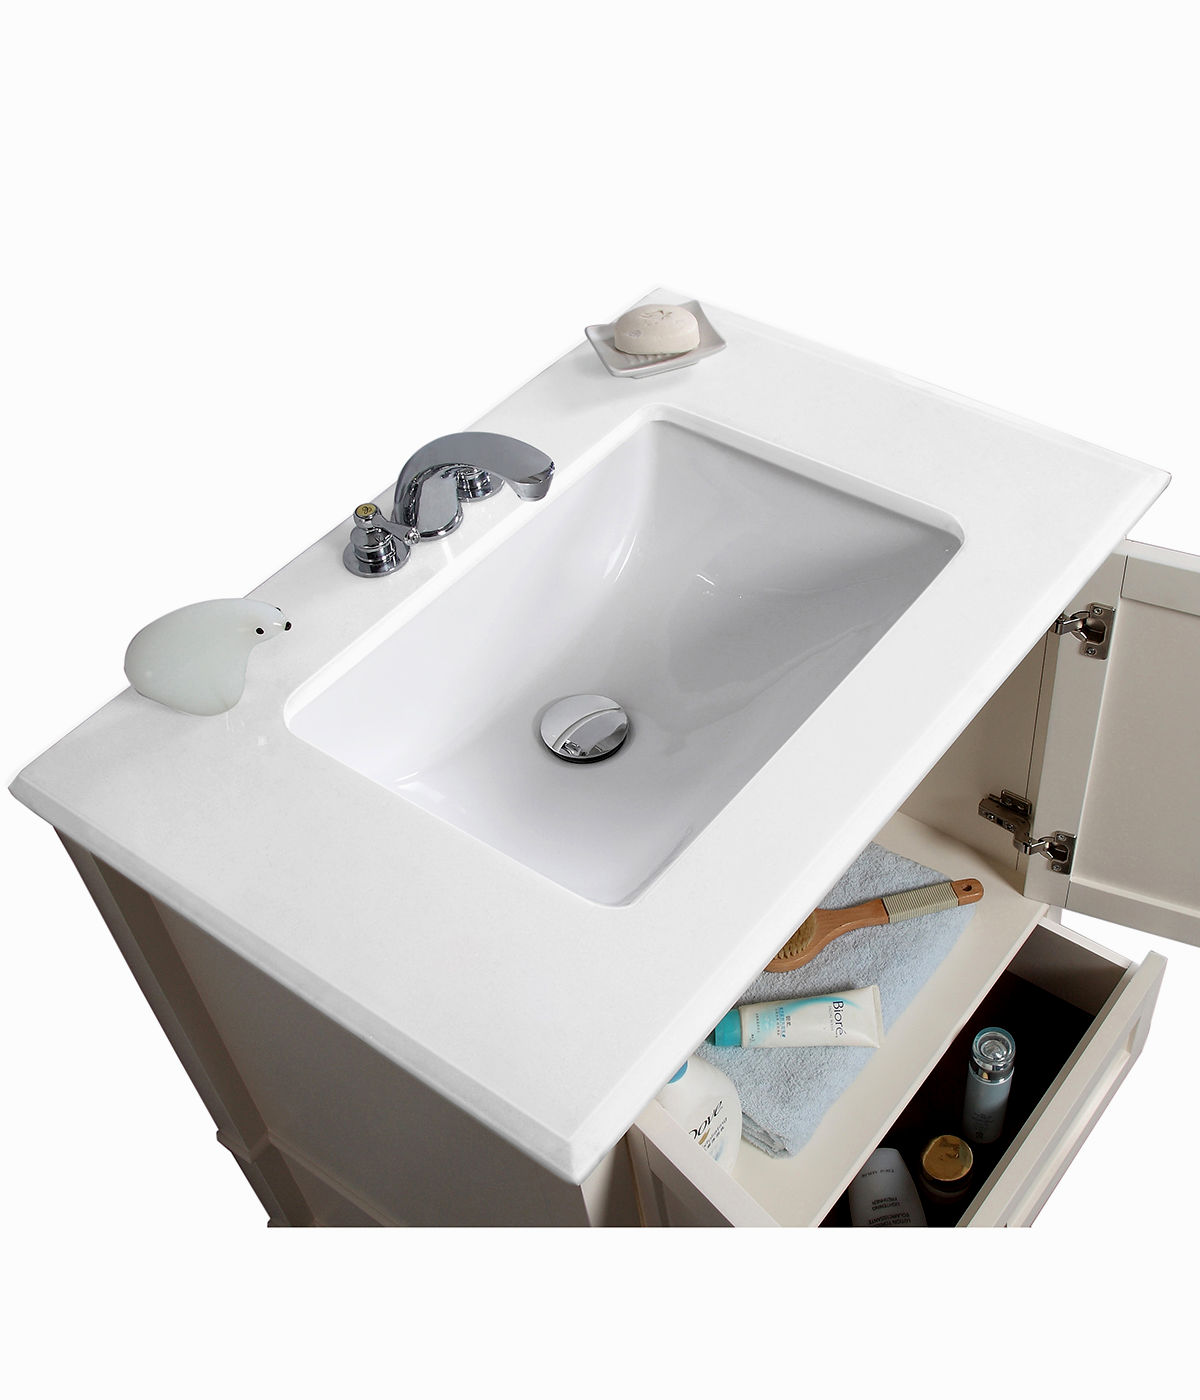 top walmart bathroom vanity collection-Amazing Walmart Bathroom Vanity Layout